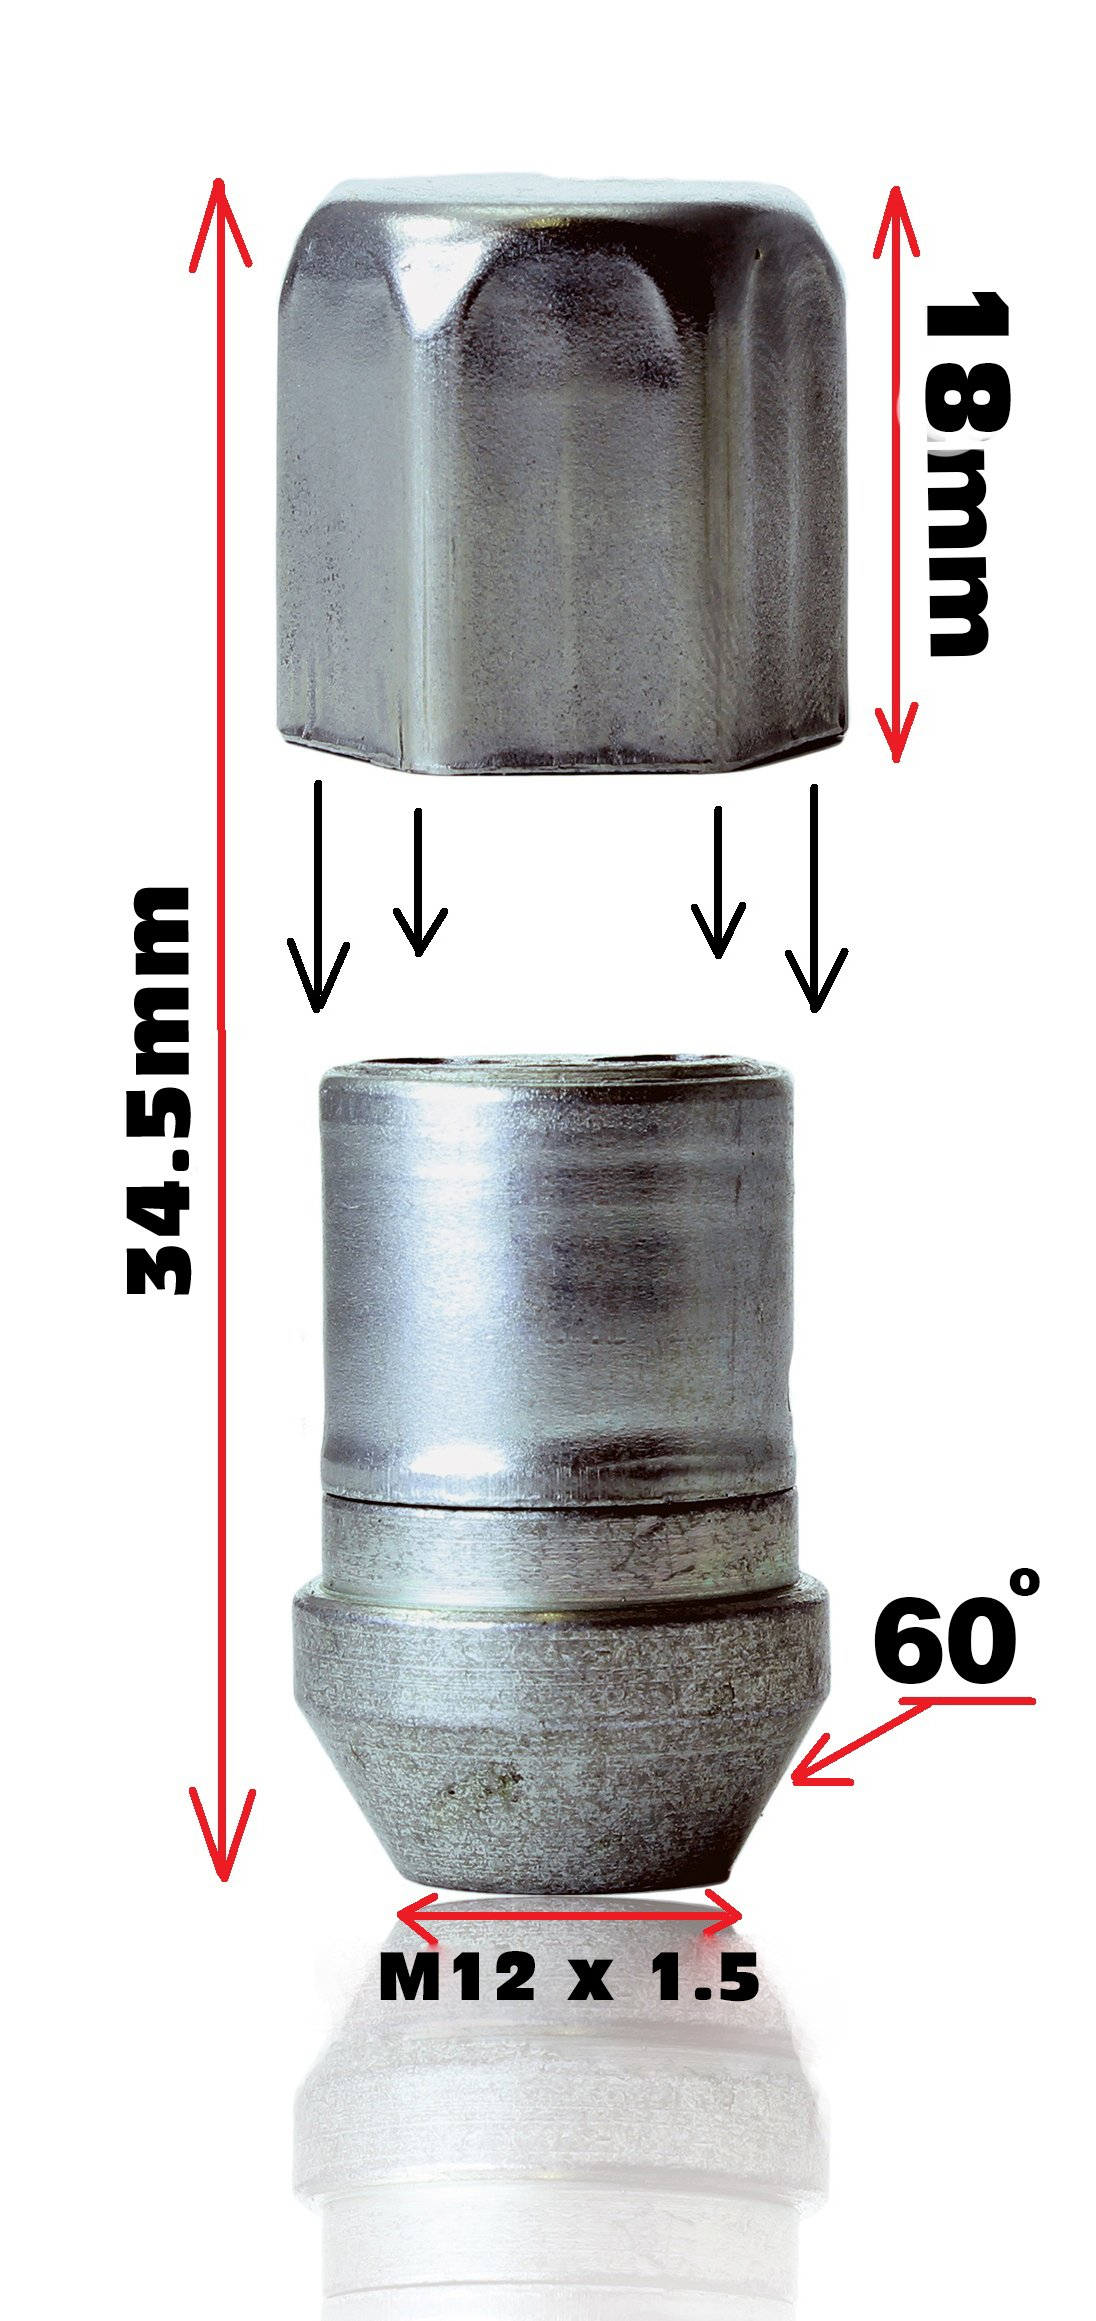 Vauxhal Frontera Models Heyner Germany StillBull Locking Wheel Nuts Removal Key M12x1.5 Set 4 Locks Alloys Antitheft Protection Bolts HA